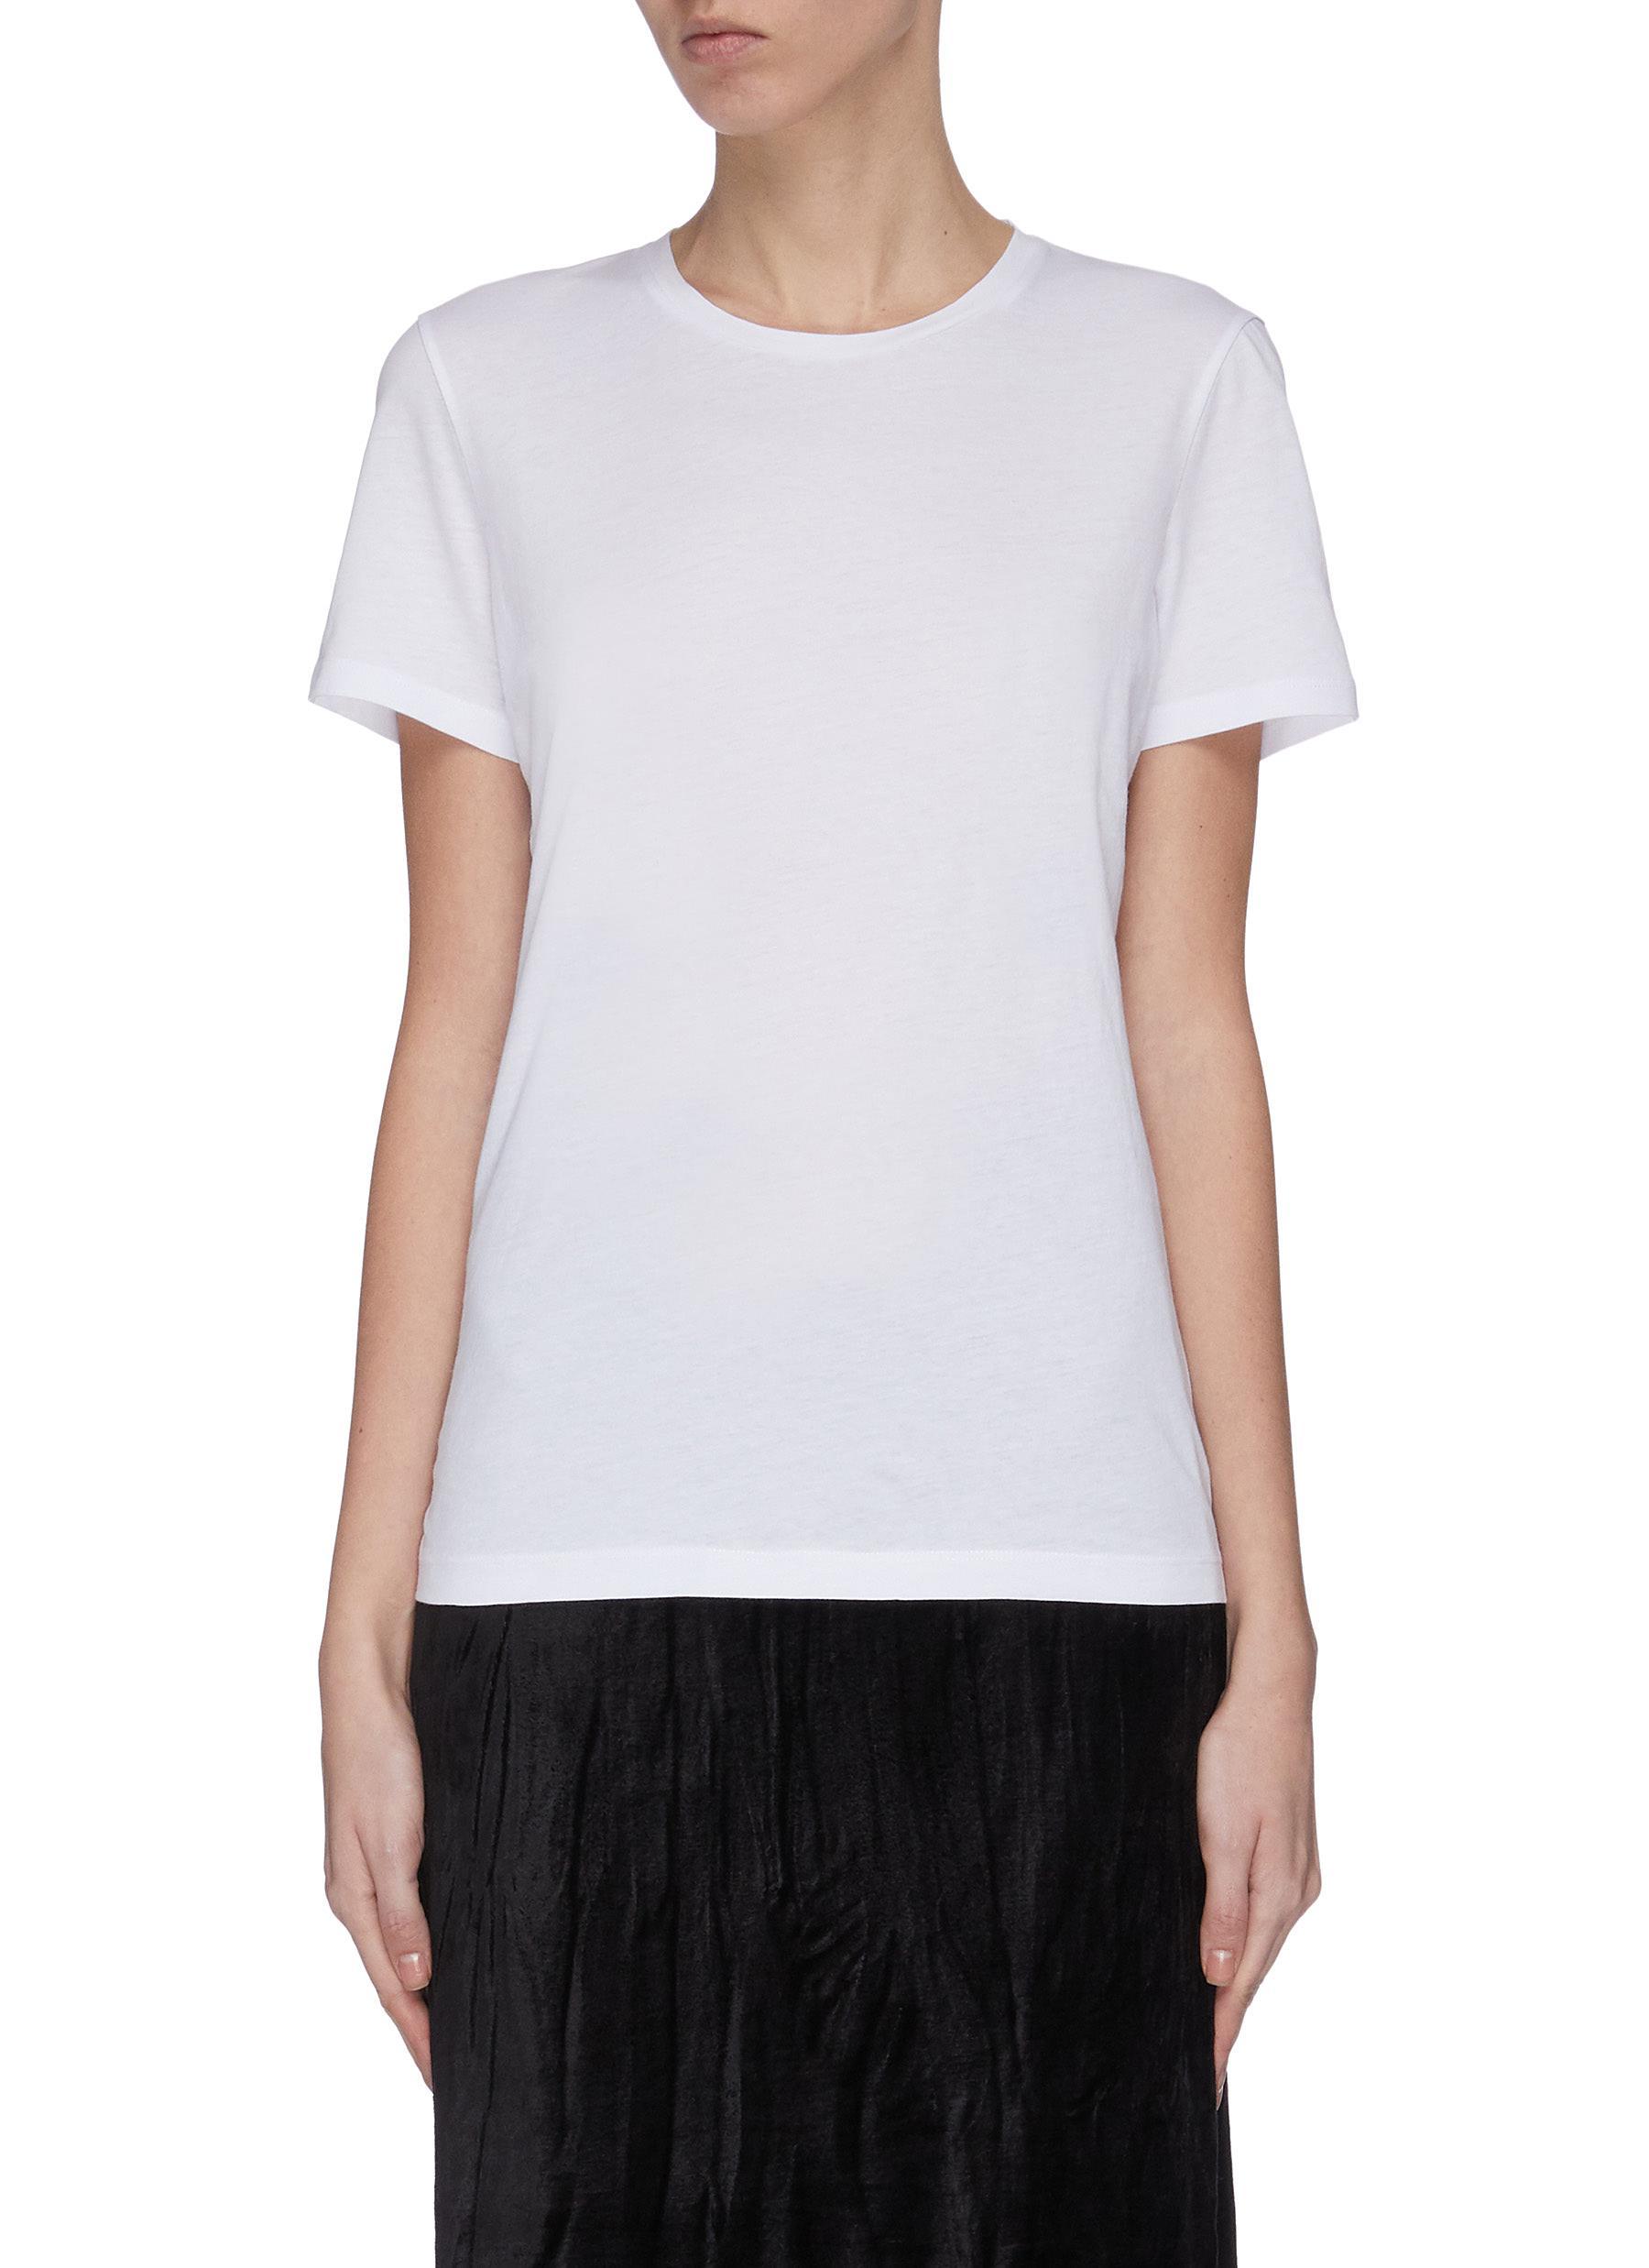 shop Ninety Percent 'Block 2B-24' Crewneck T-shirt online